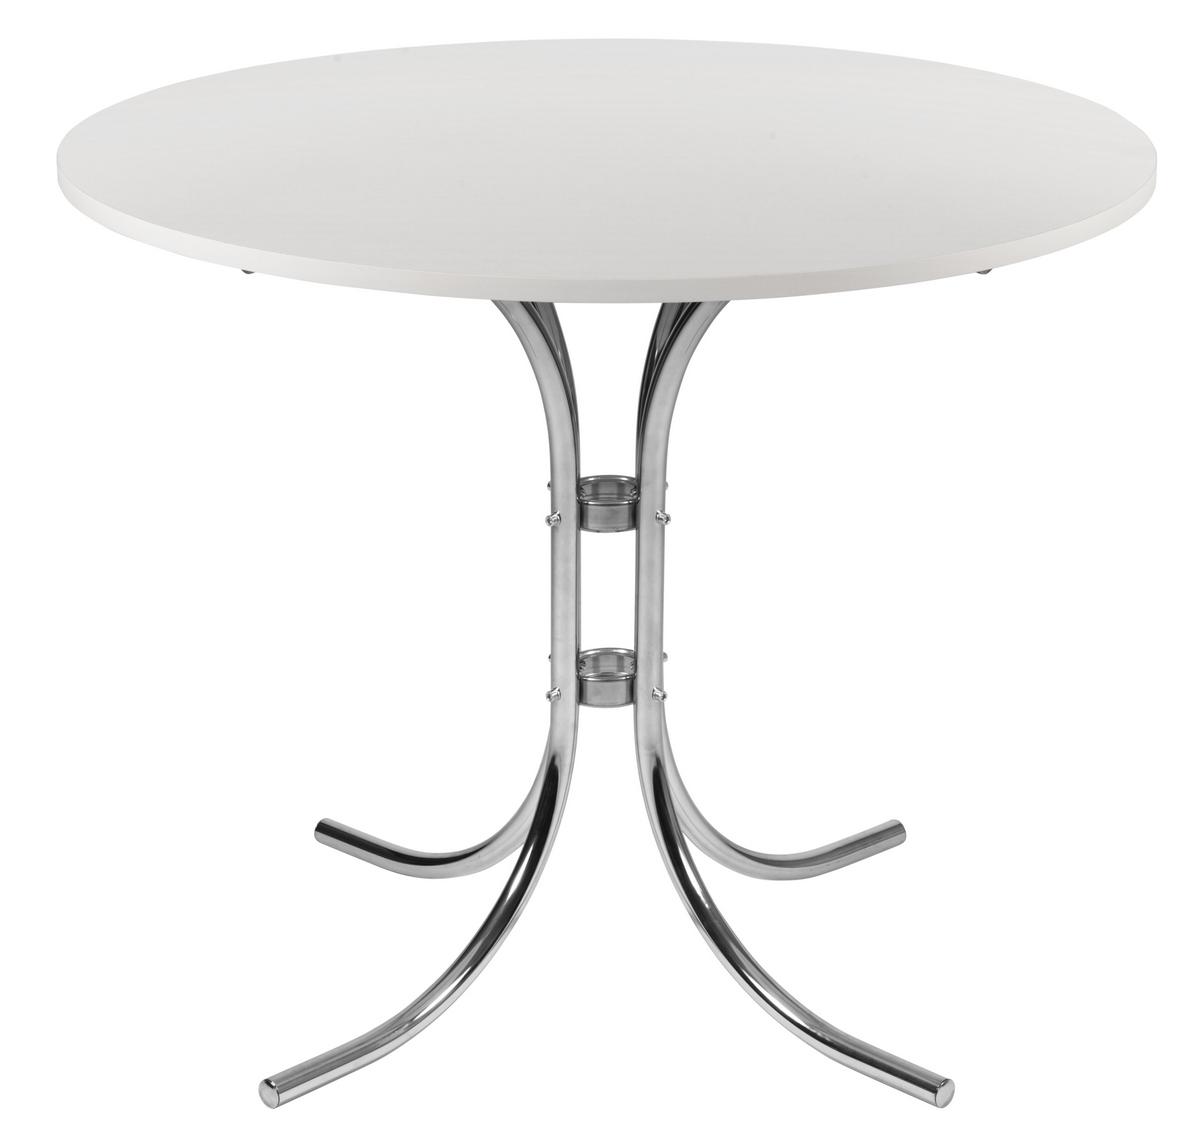 John Deere Cafe Table : Bistro tables